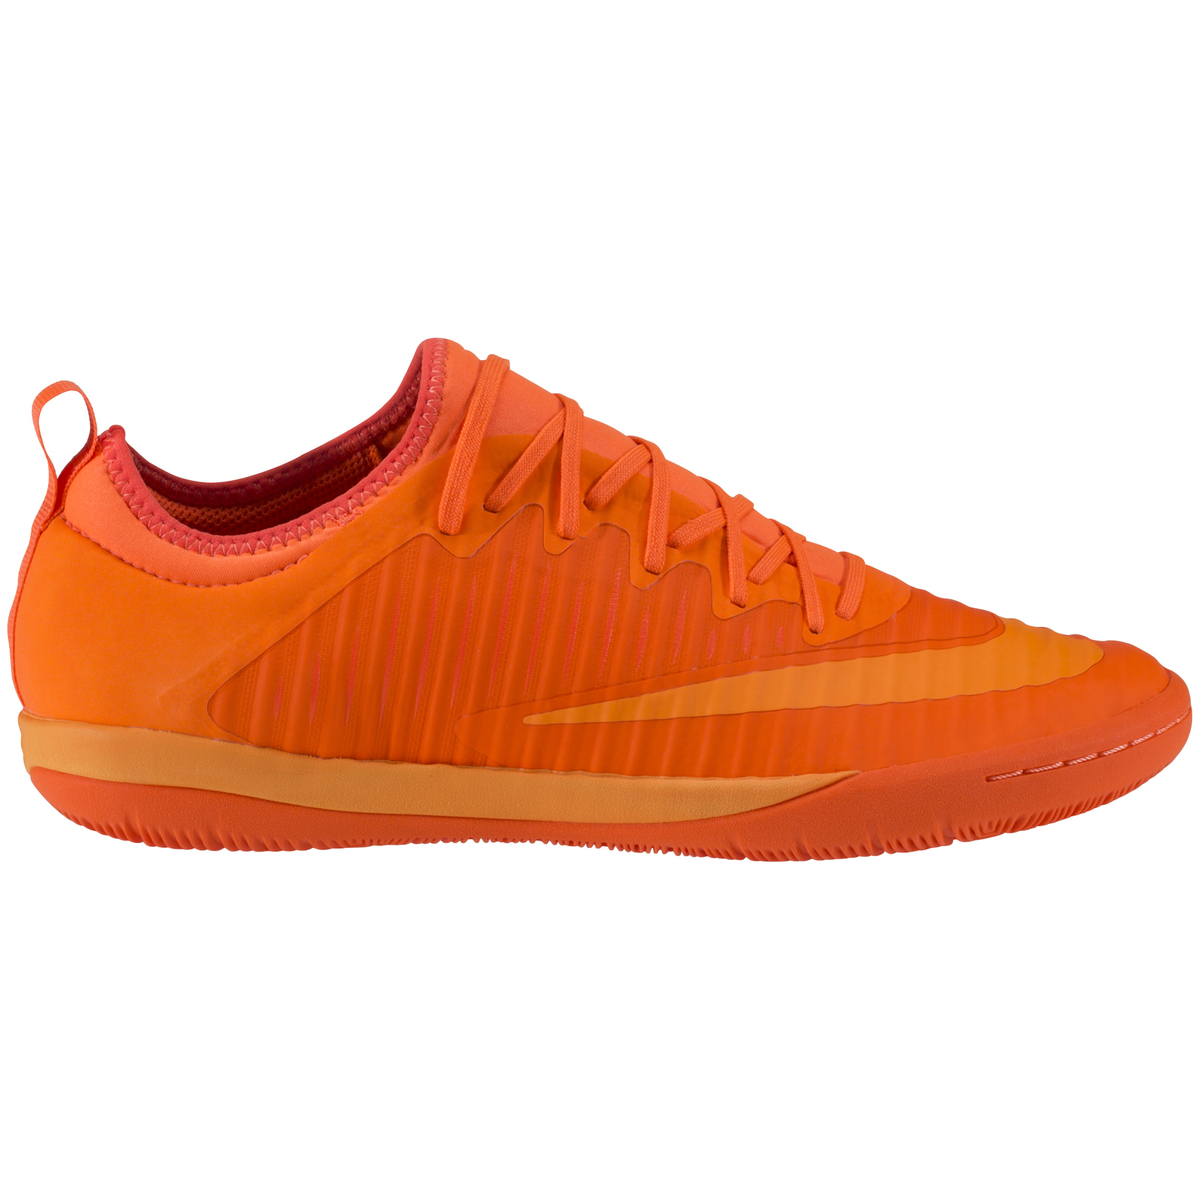 separation shoes edf9b 90d2b nike mercurialx finale ii ic q4 16 fotbollssko senior fotbollsskor